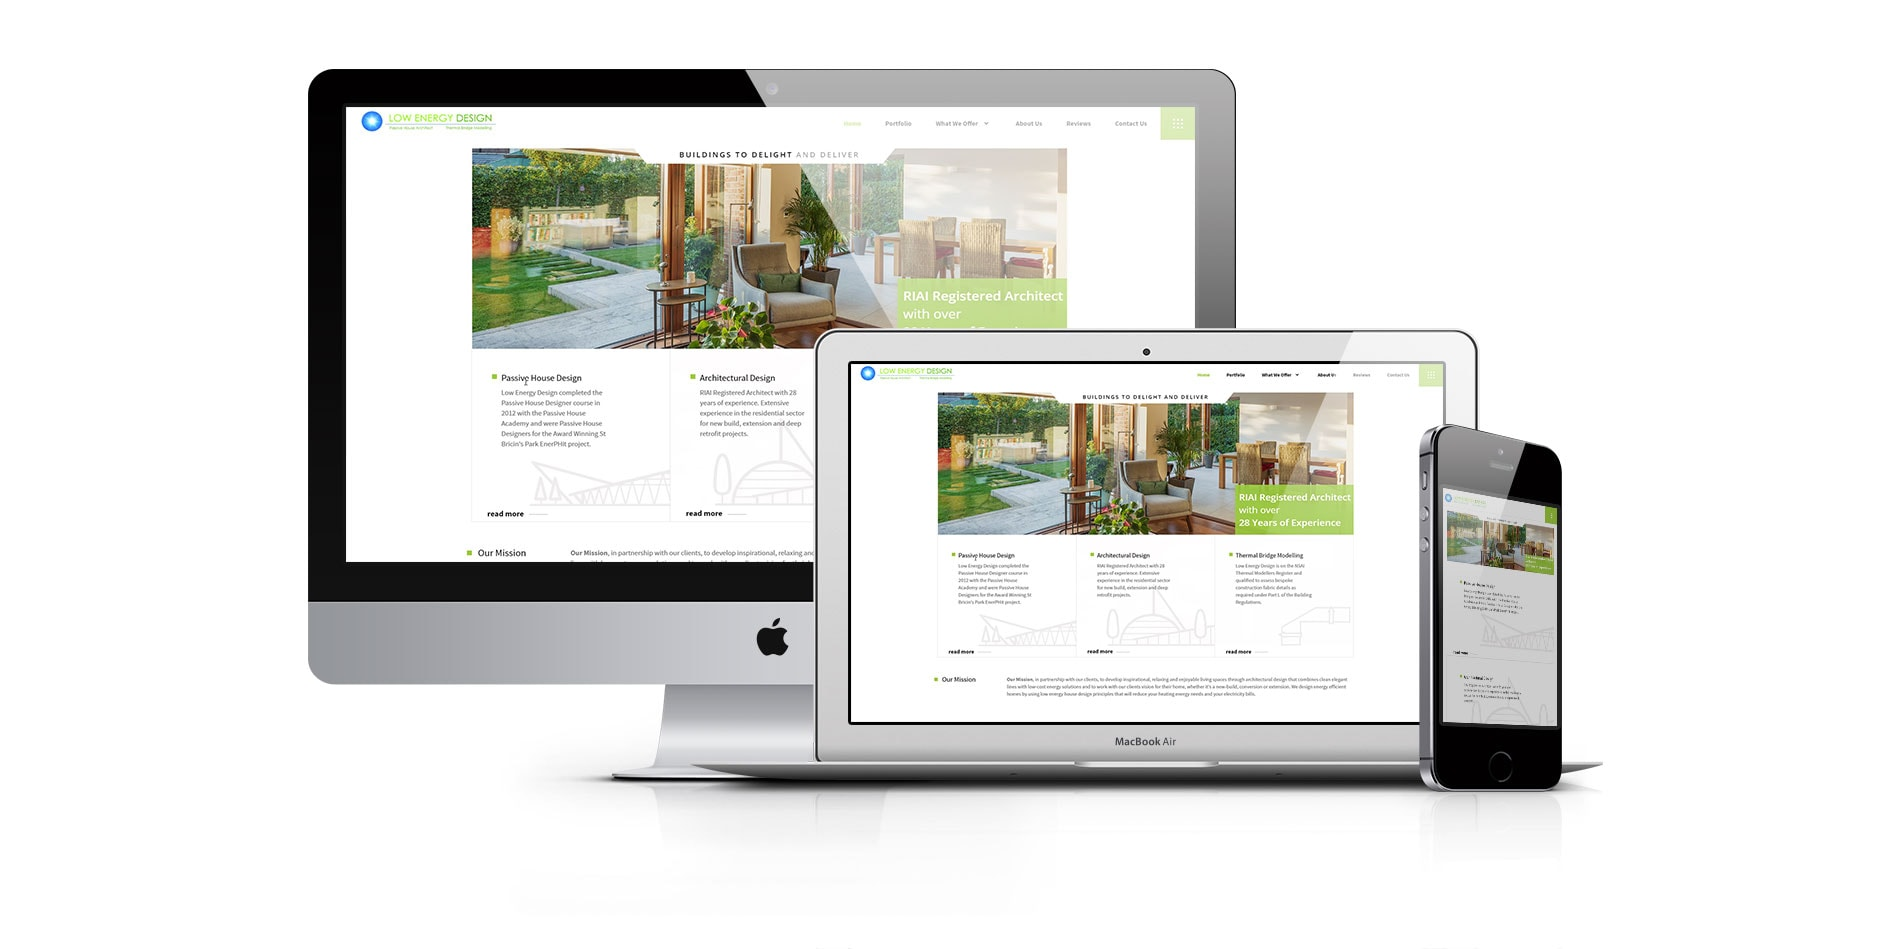 website design for low energu design ireland - website featured image